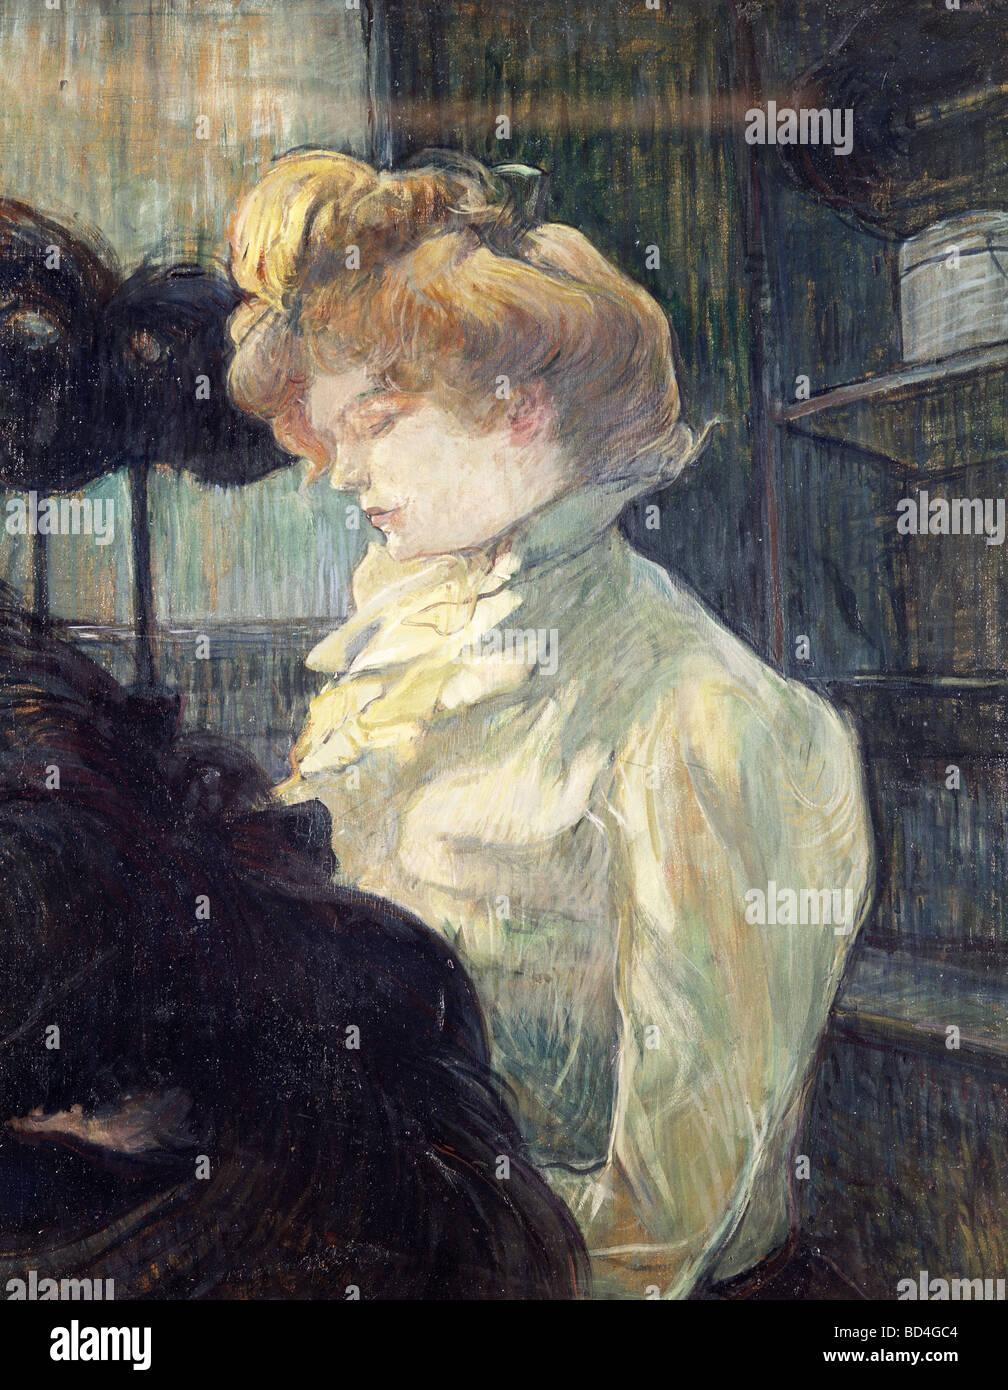 Bildende Kunst, Toulouse-Lautrec, Henri de (1864-1901), Malerei, 'La Modiste', 1900, Museum Albi, Europa, Frankreich, Stockfoto